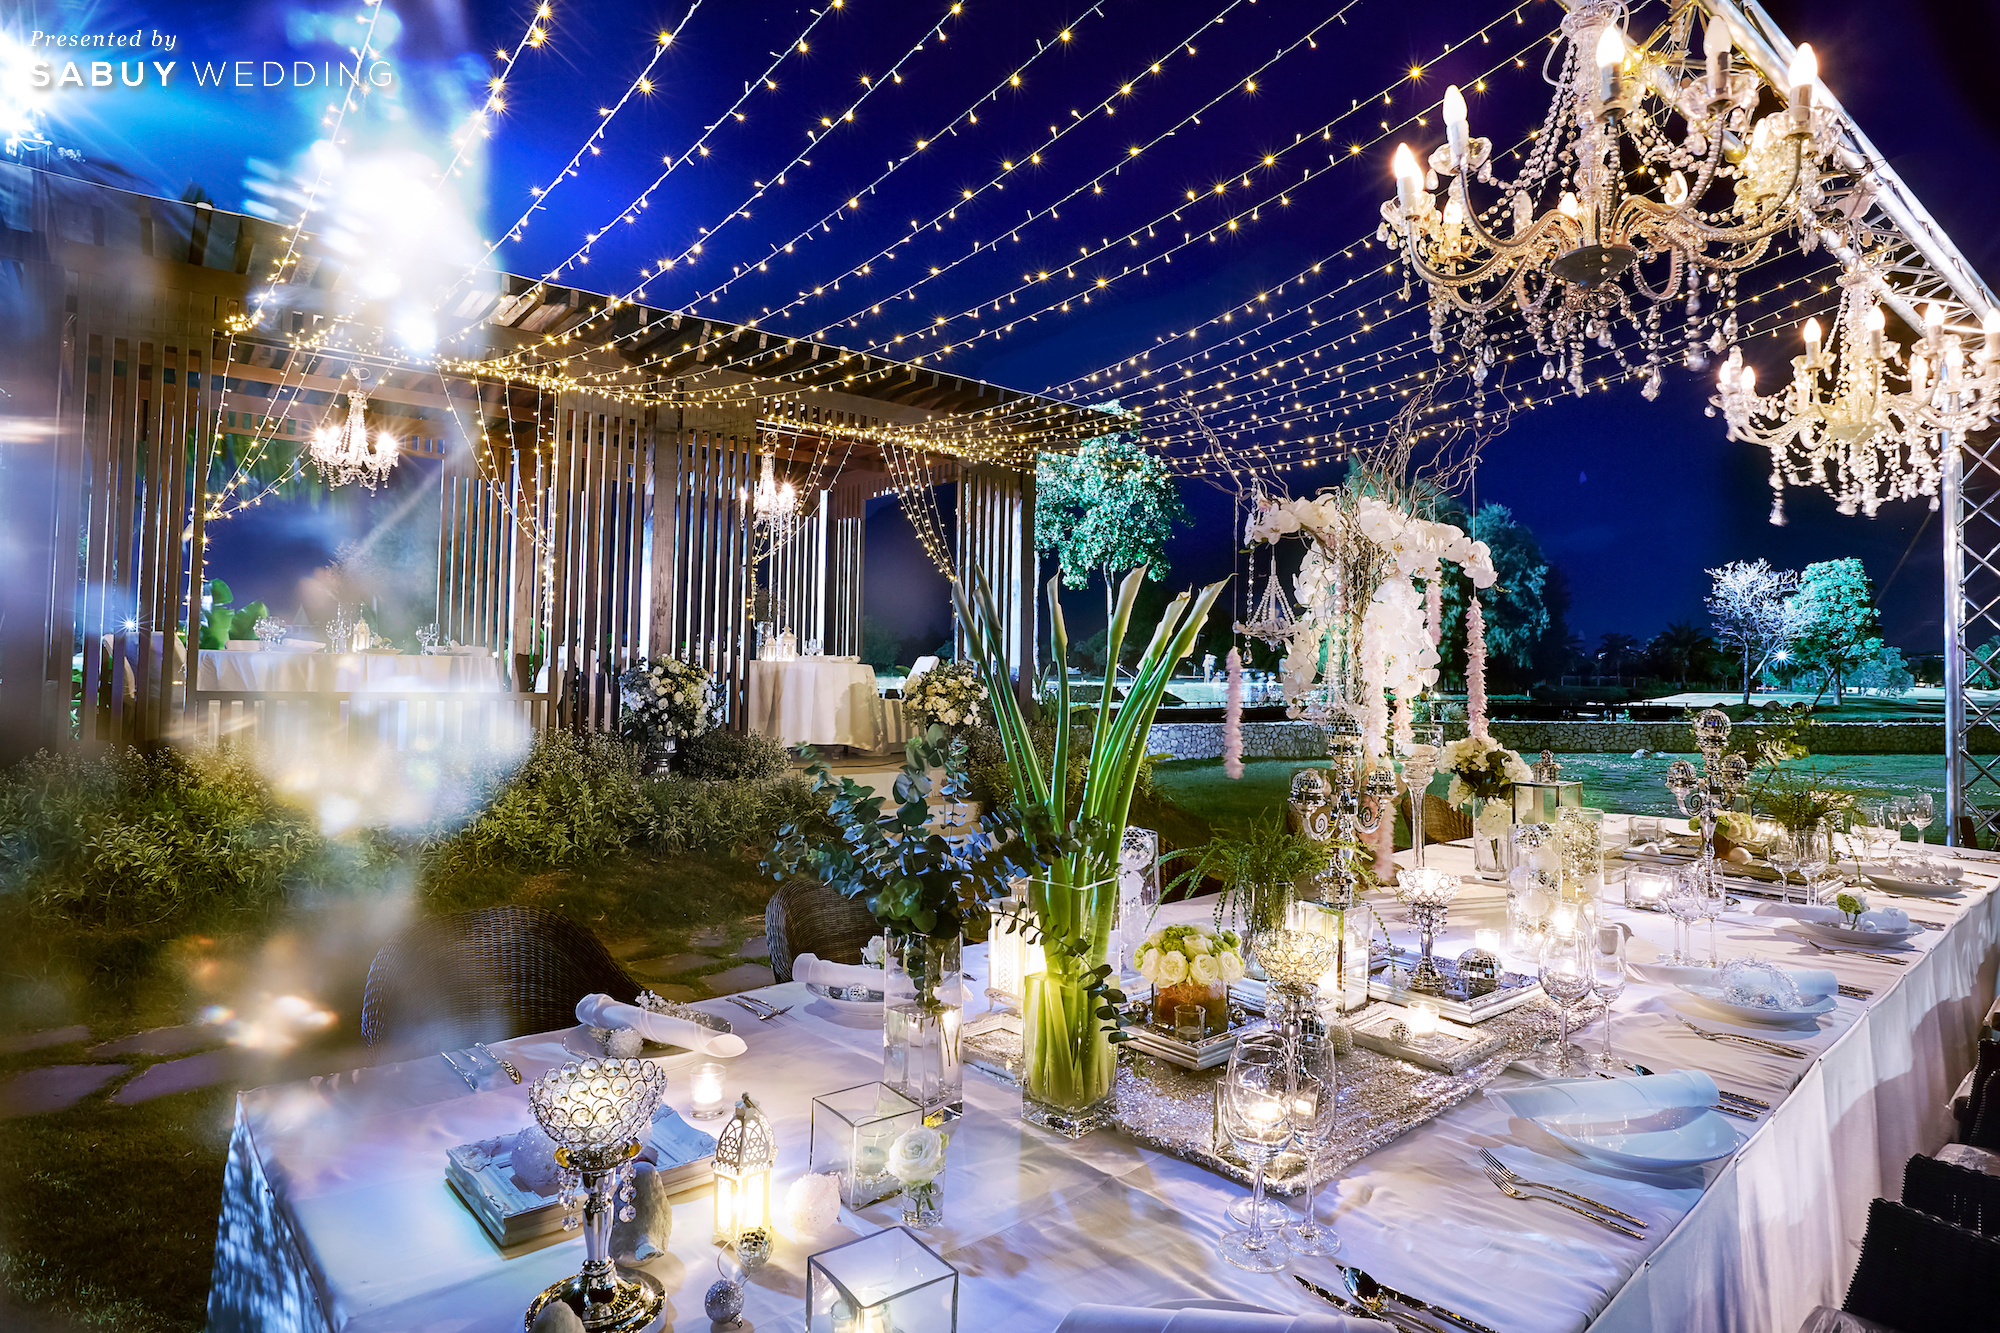 LE MÉRIDIEN SUVARNABHUMI BANGKOK, GOLF RESORT & SPA,Marriott Wedding Thailand,แมริออท ประเทศไทย,สถานที่แต่งงาน,สถานที่จัดงานแต่งงาน,โรงแรม,งานแต่งงาน,งานเลี้ยง,งานแต่งในสวน,งานแต่ง outdoor ครบทุกความต้องการของบ่าวสาว กับ 40 สถานที่แต่งงานในเครือ Marriott